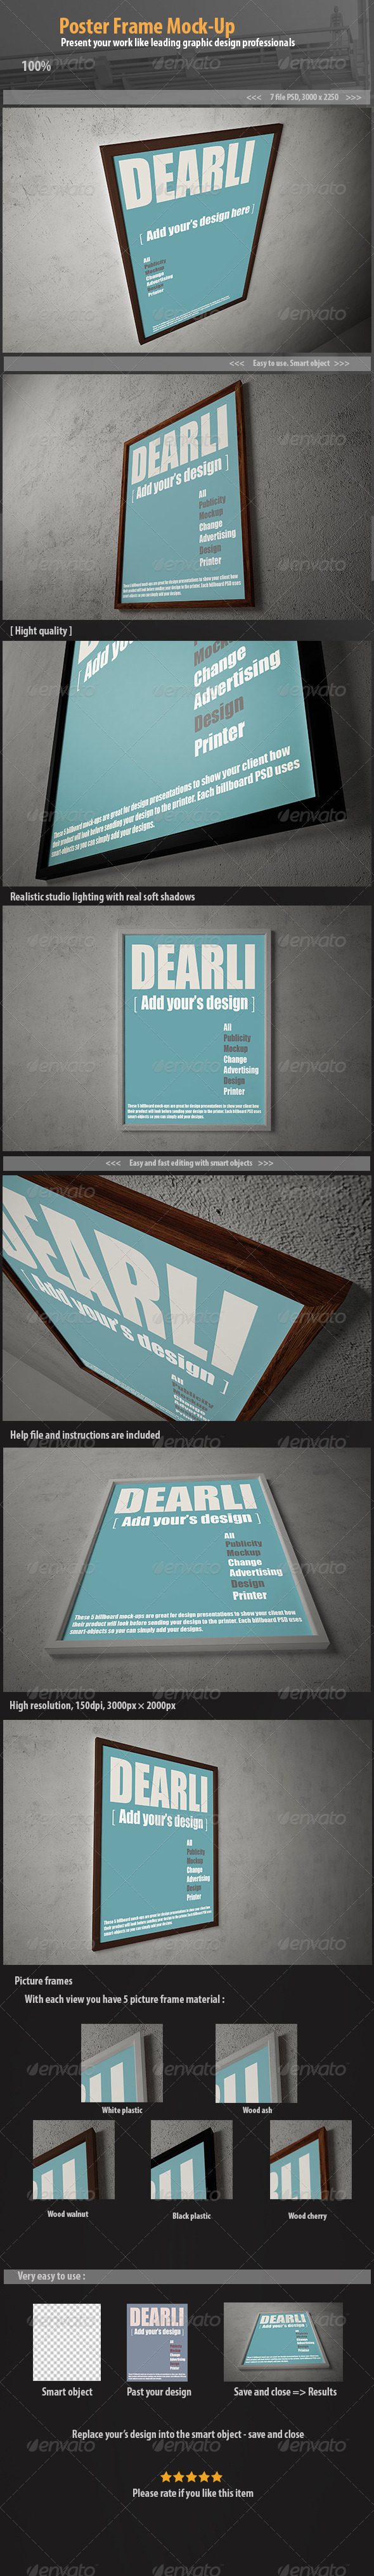 Poster Frame Mock-Up - Posters Print